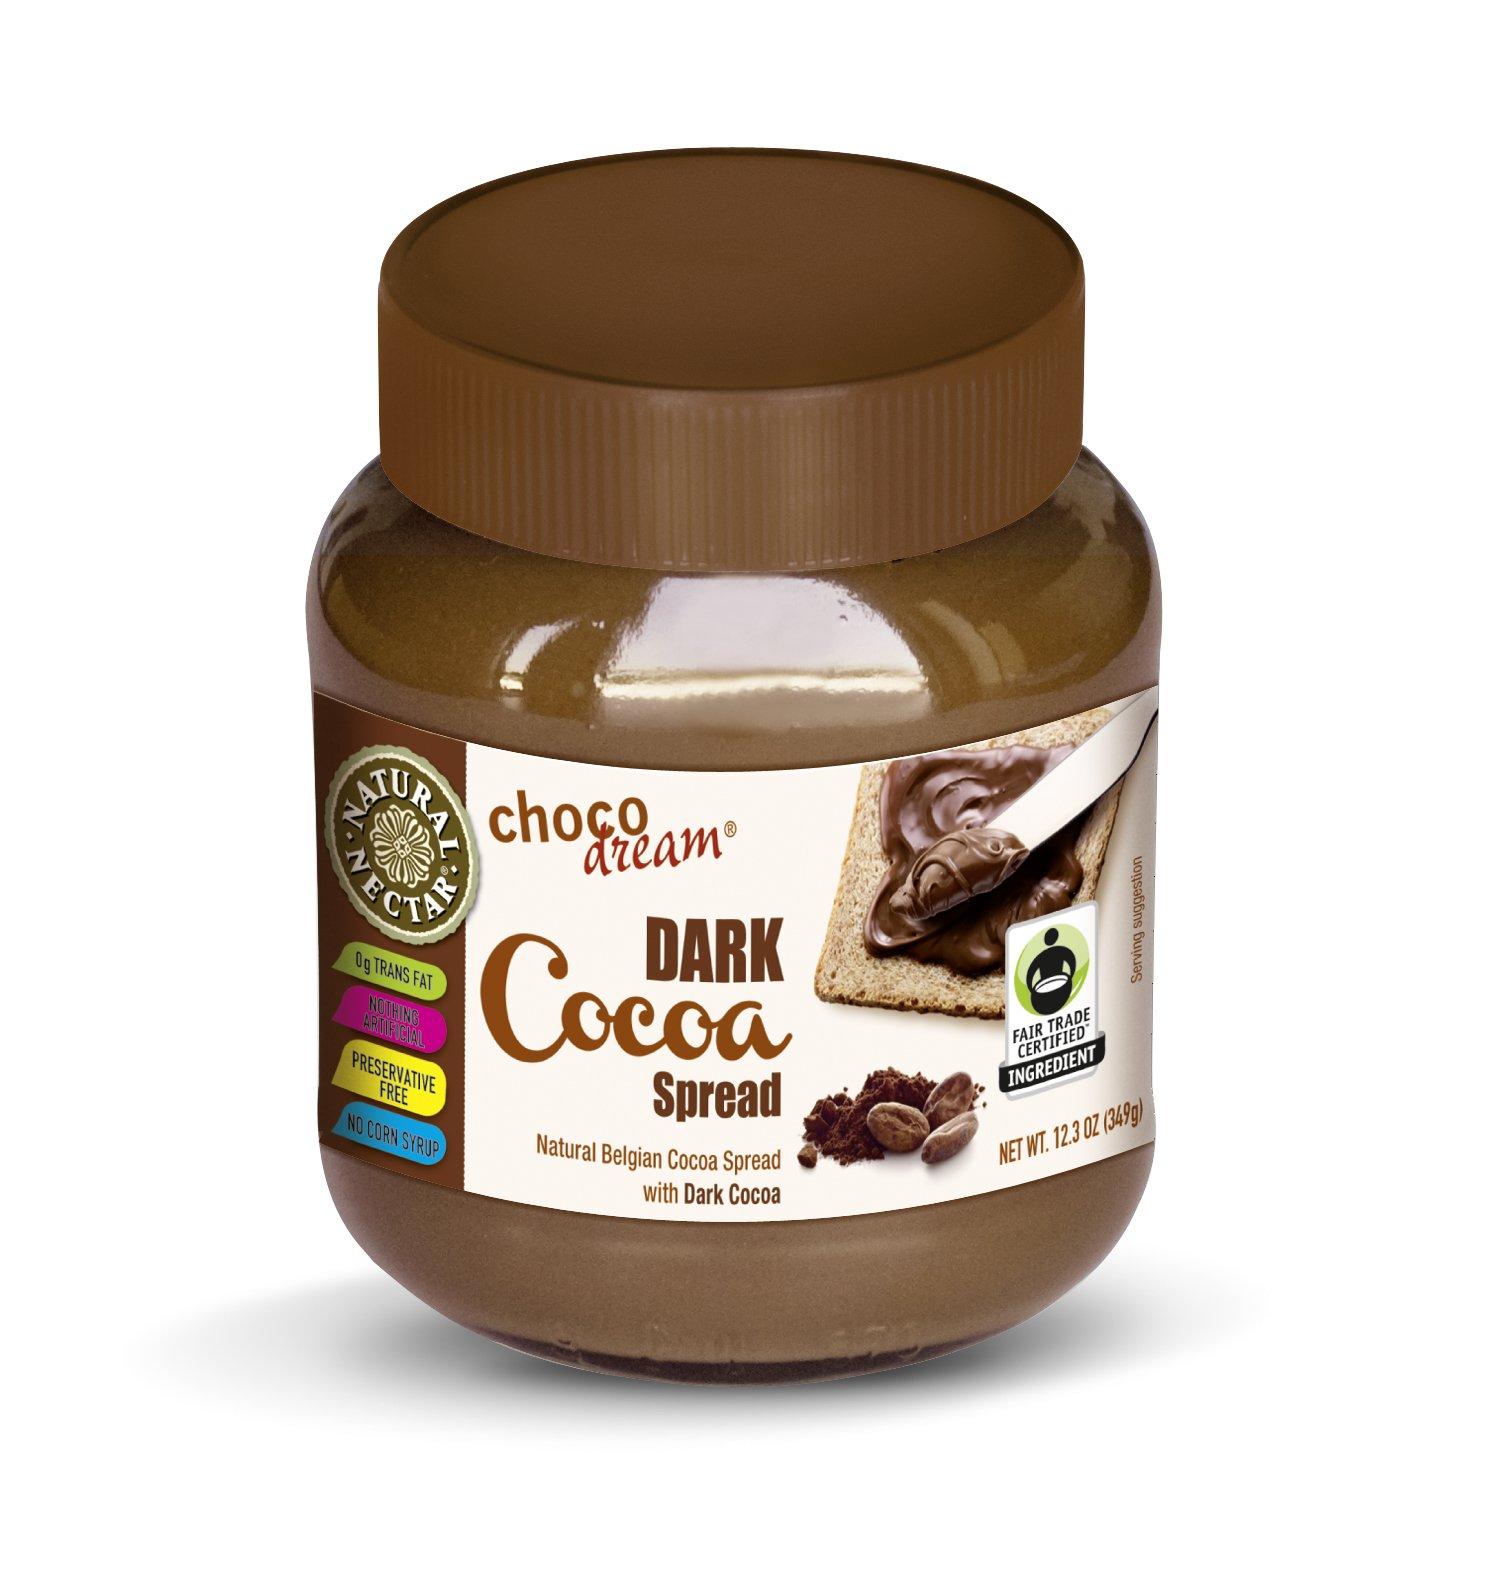 Natural Nectar Dark Chocolate Spread, Choco Dream, 12.3 Ounce (Pack of 6)